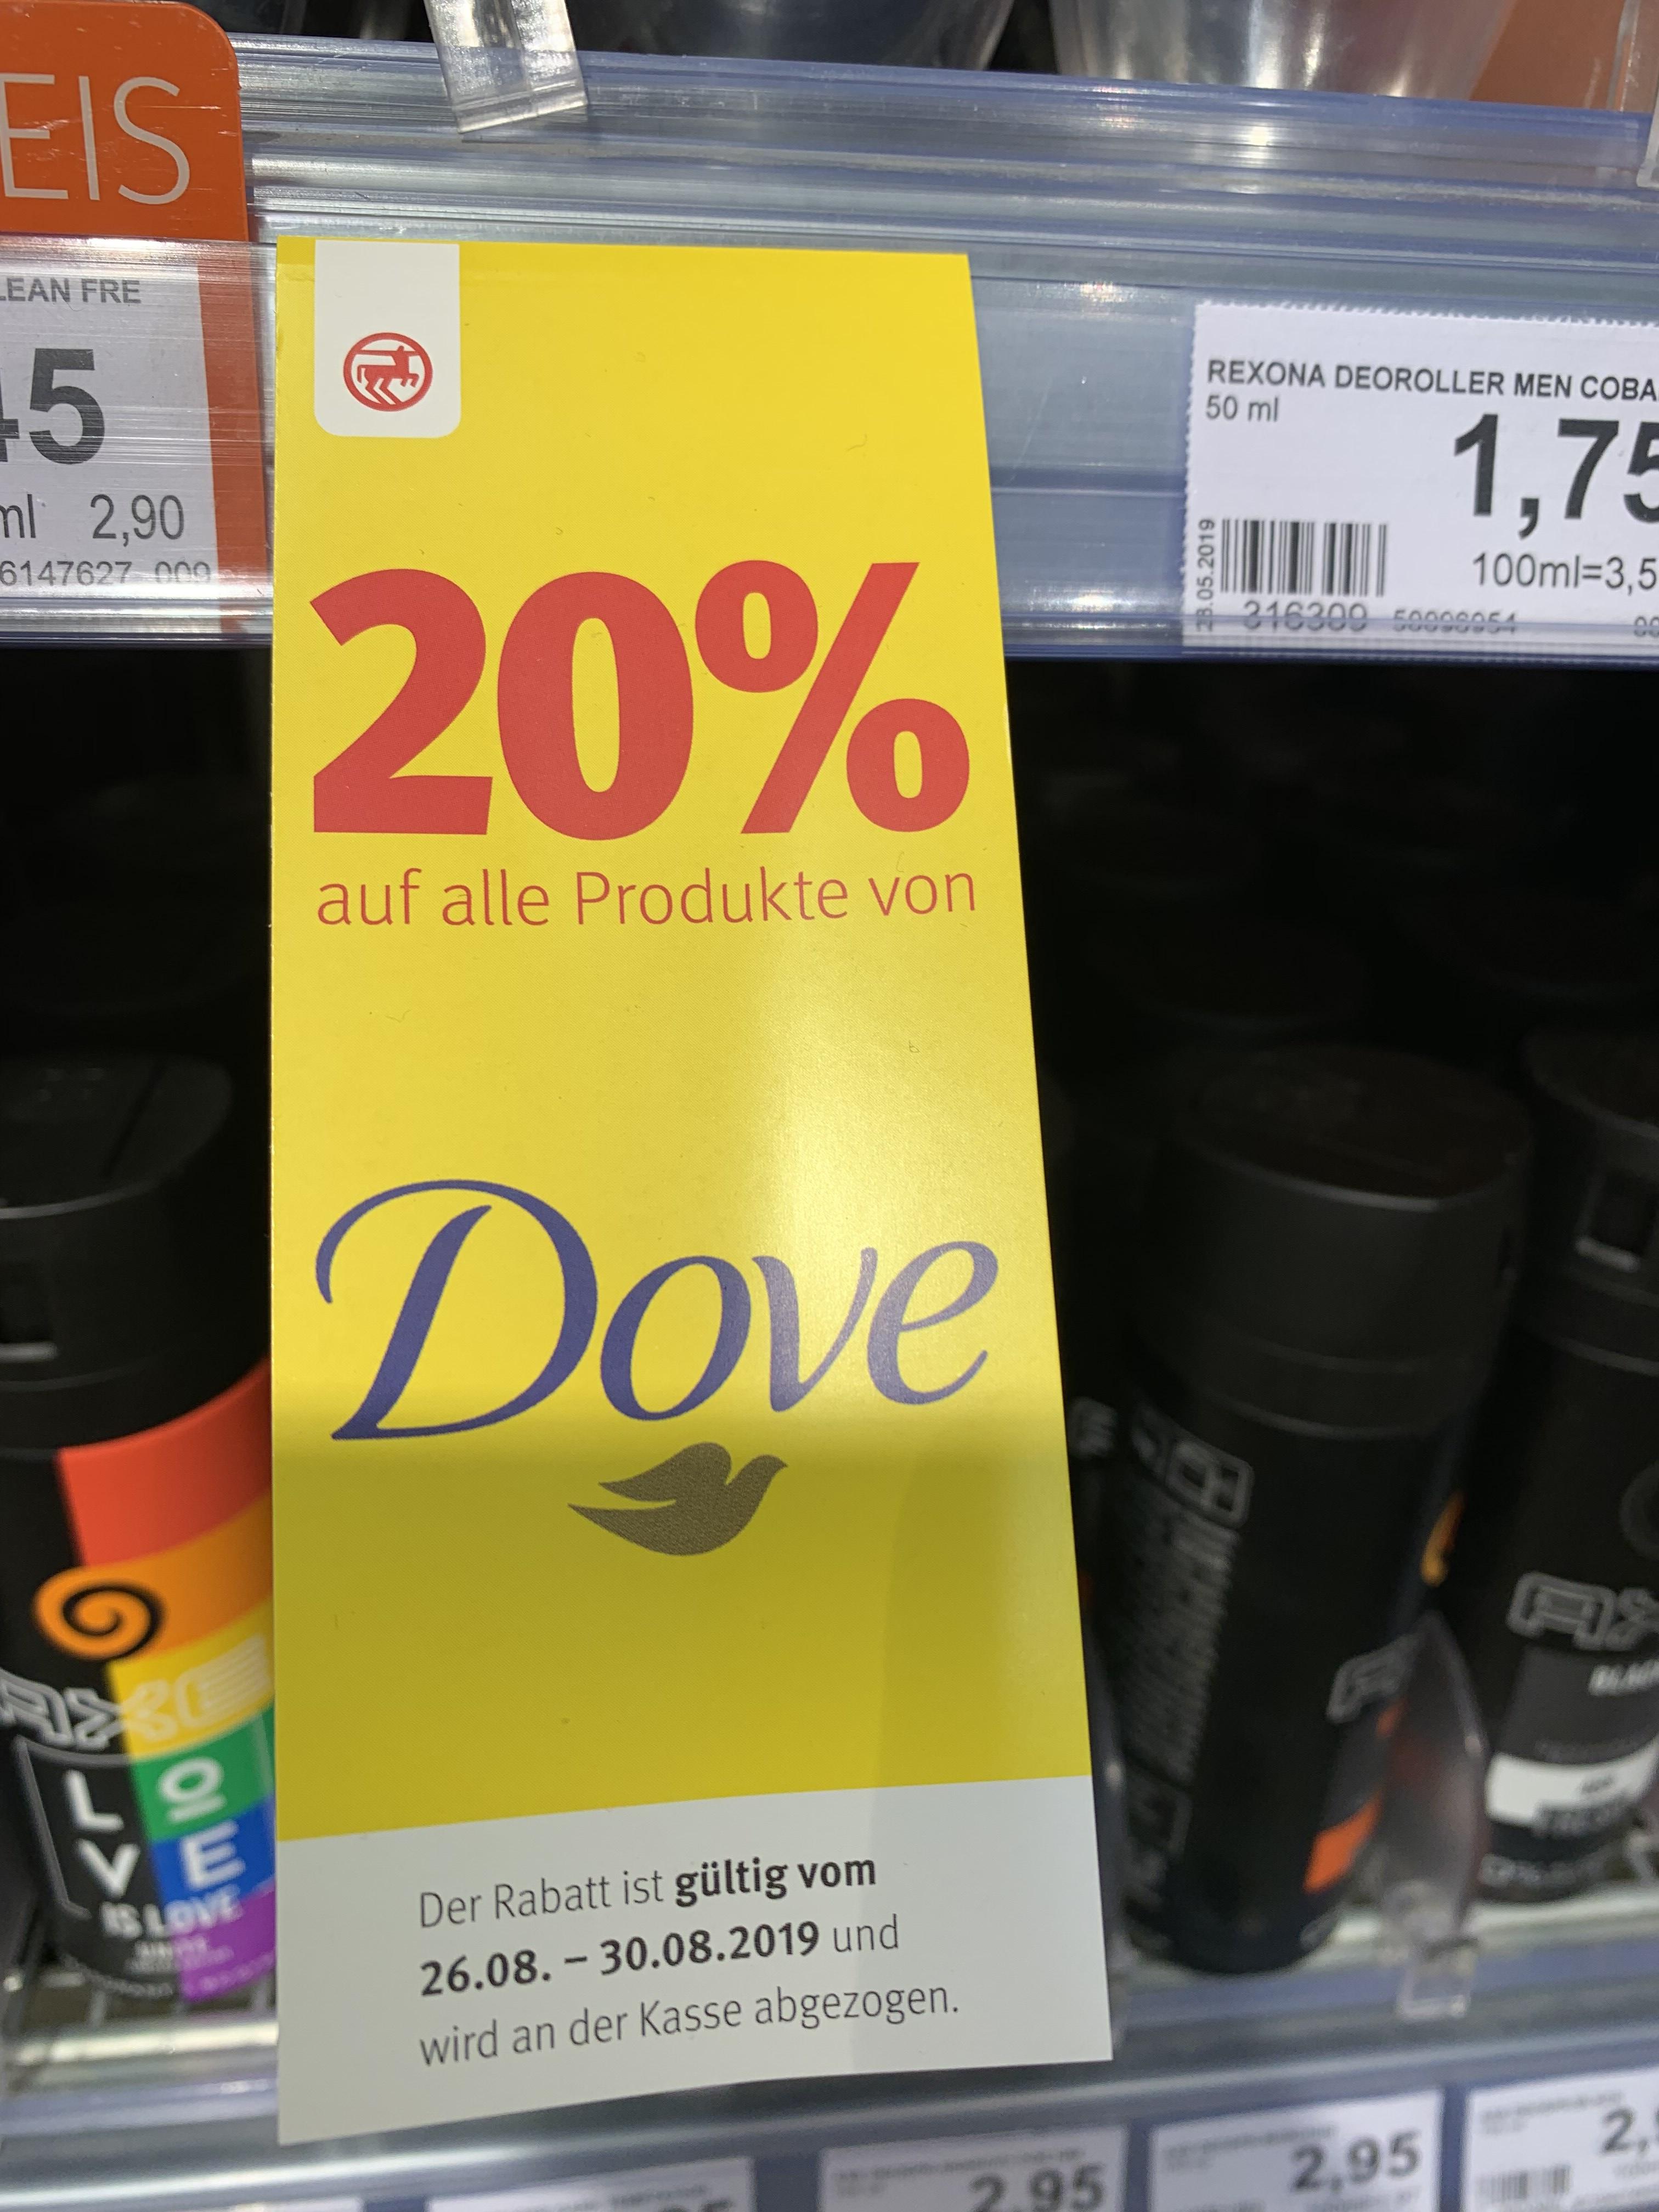 [LOKAL] oder Bundesweit Rossmann 20% auf Dove